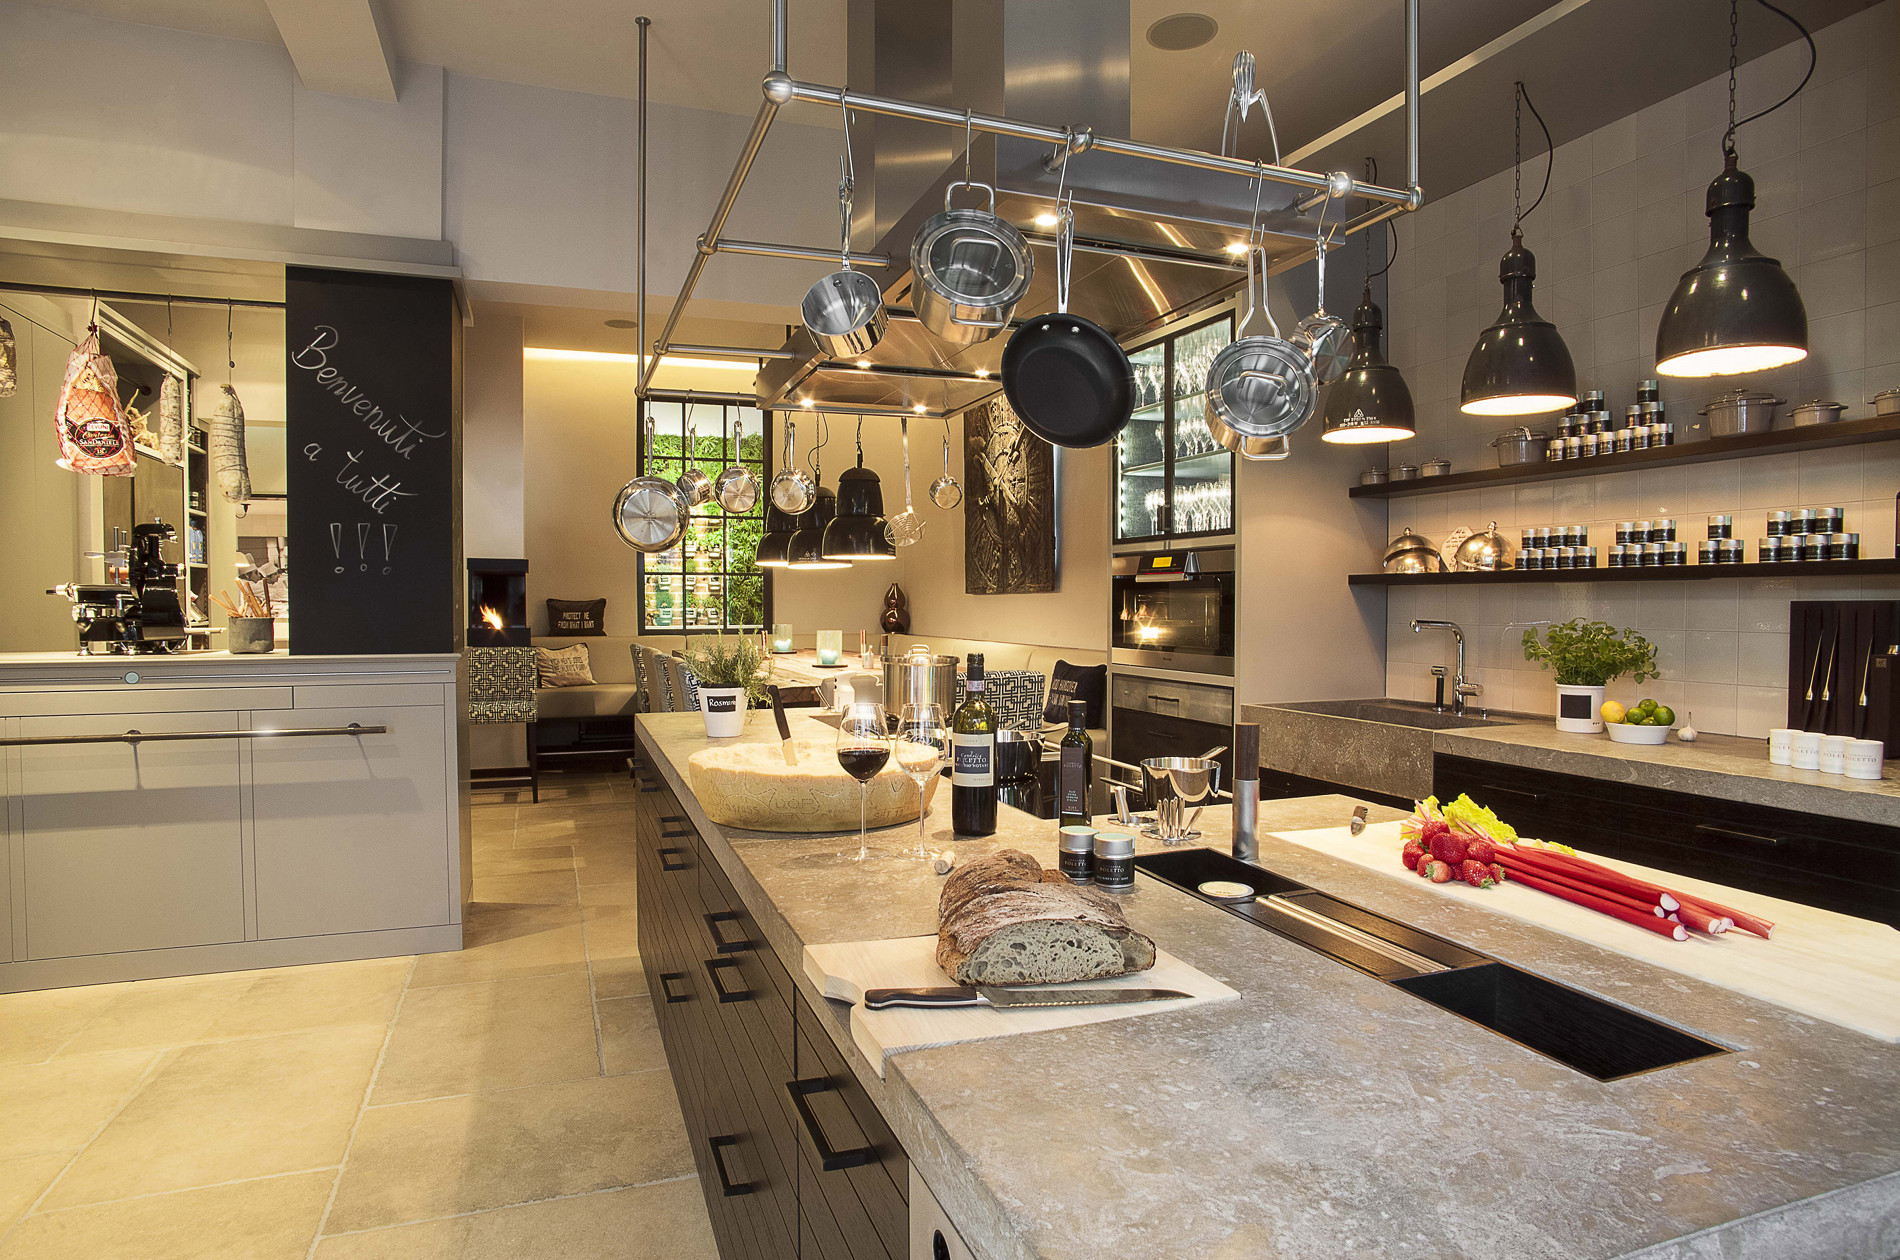 Cucina Cornelia Poletto | cookionista